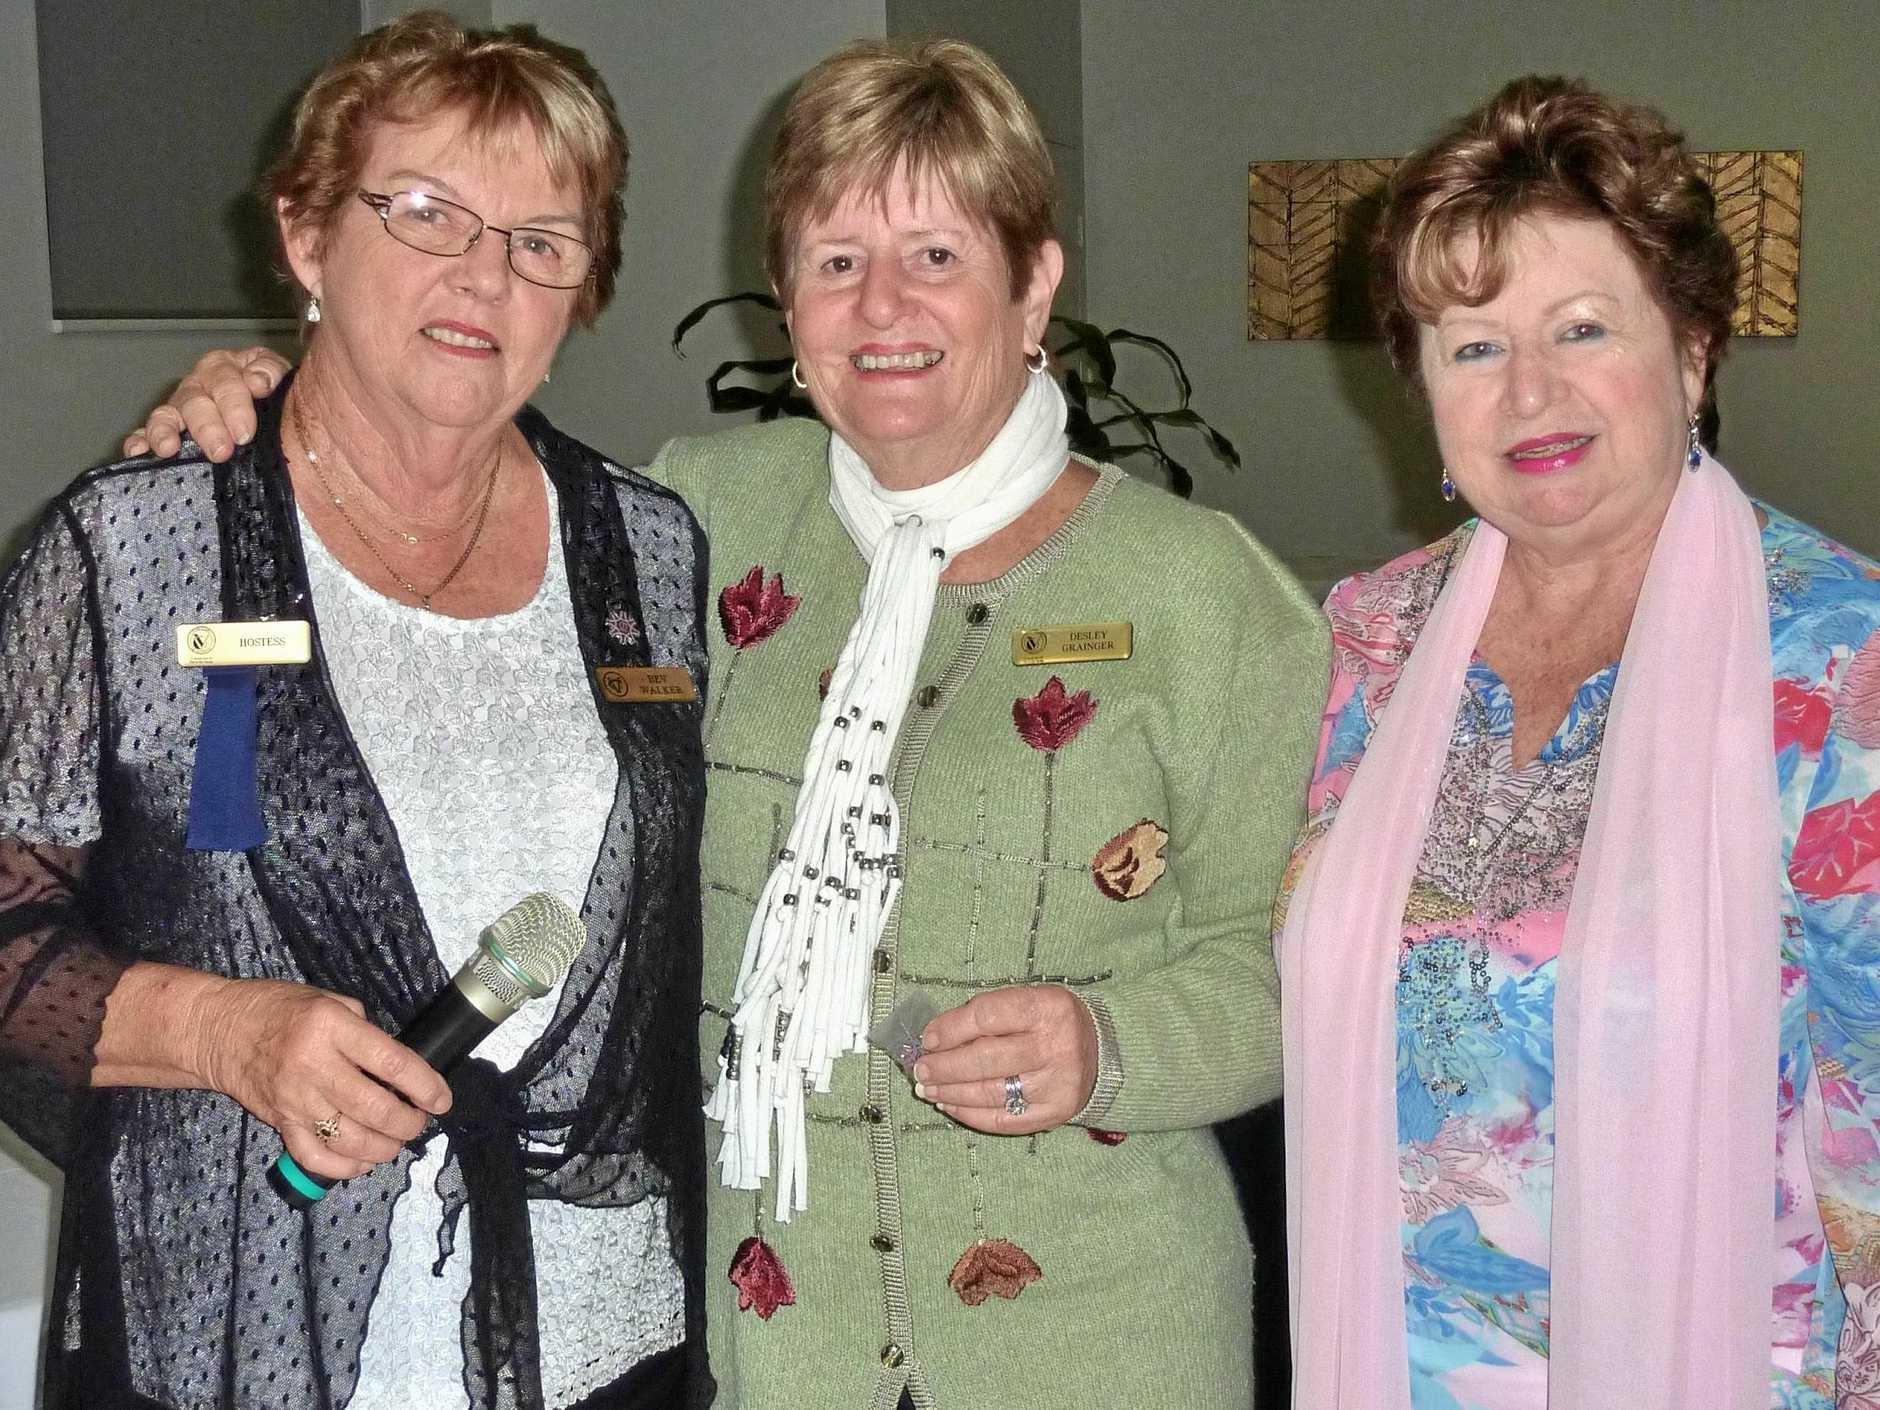 VIEW Founding Member, Bev Walker, congratulates Desley Grainger and Linda Warner on receiving their 20 Year membership.